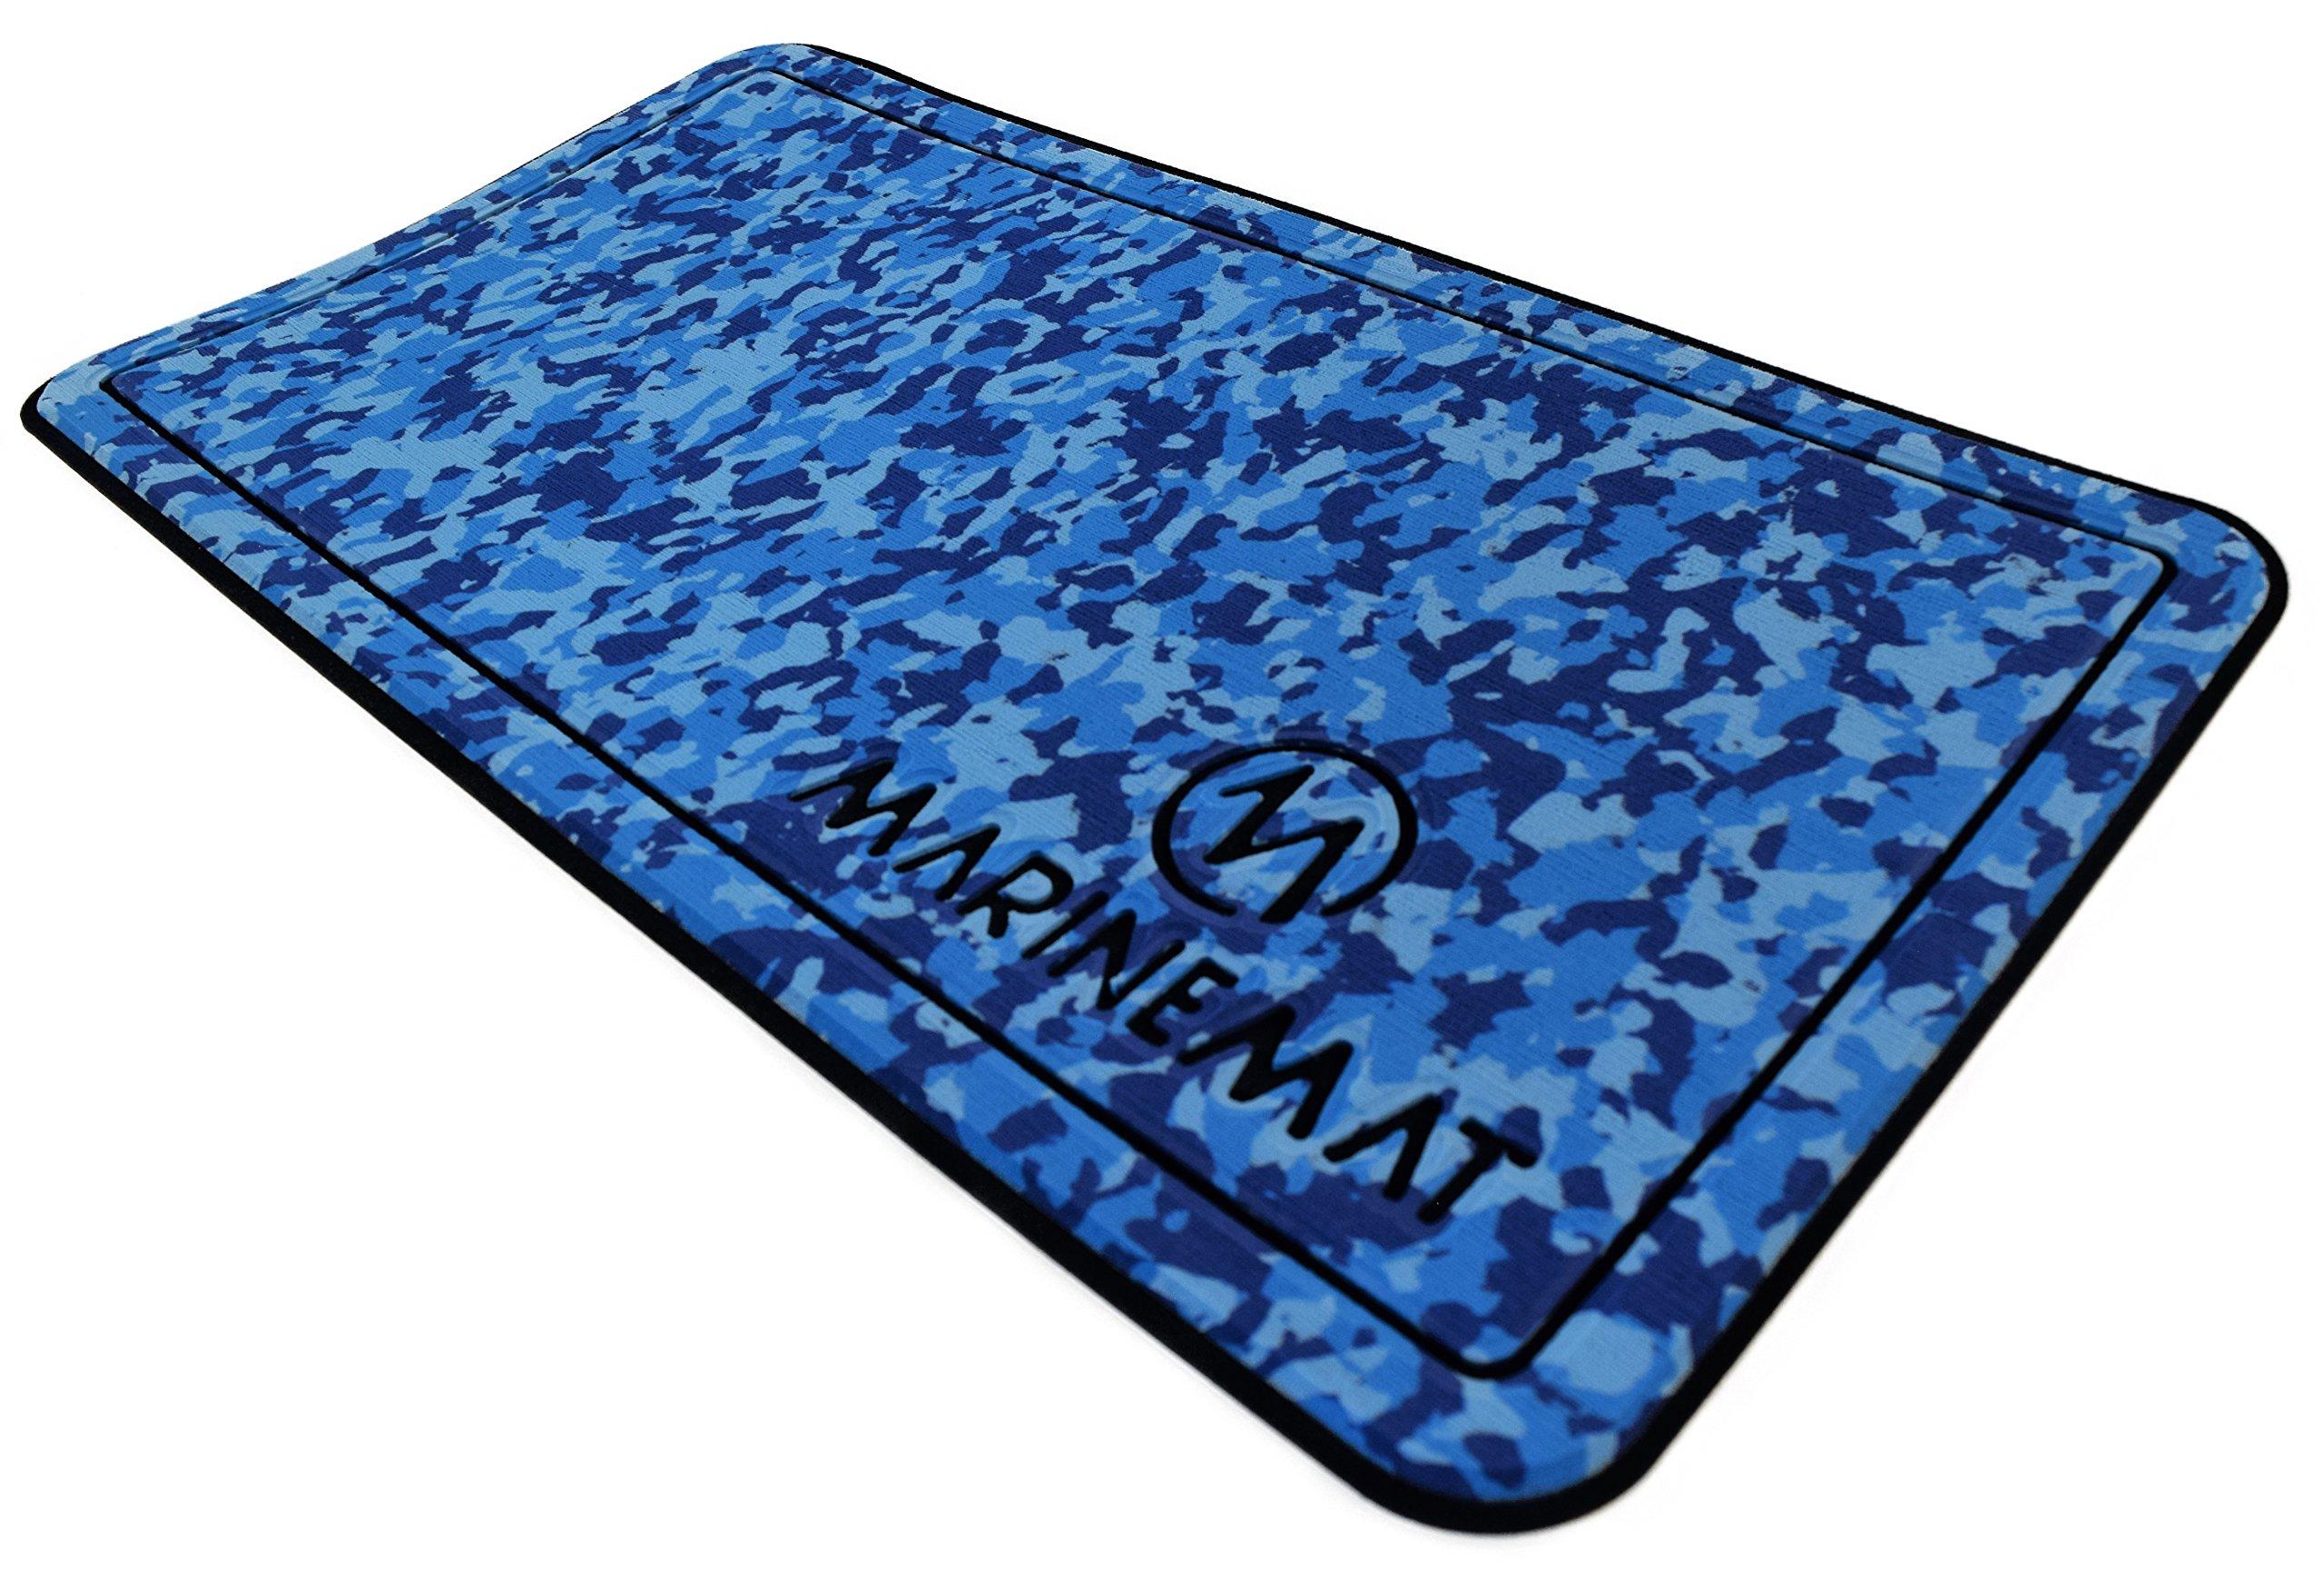 Marine Mat YETI Tundra Cooler Pad (Ocean Camo Over Black, Fits Tundra 65) by Marine Mat